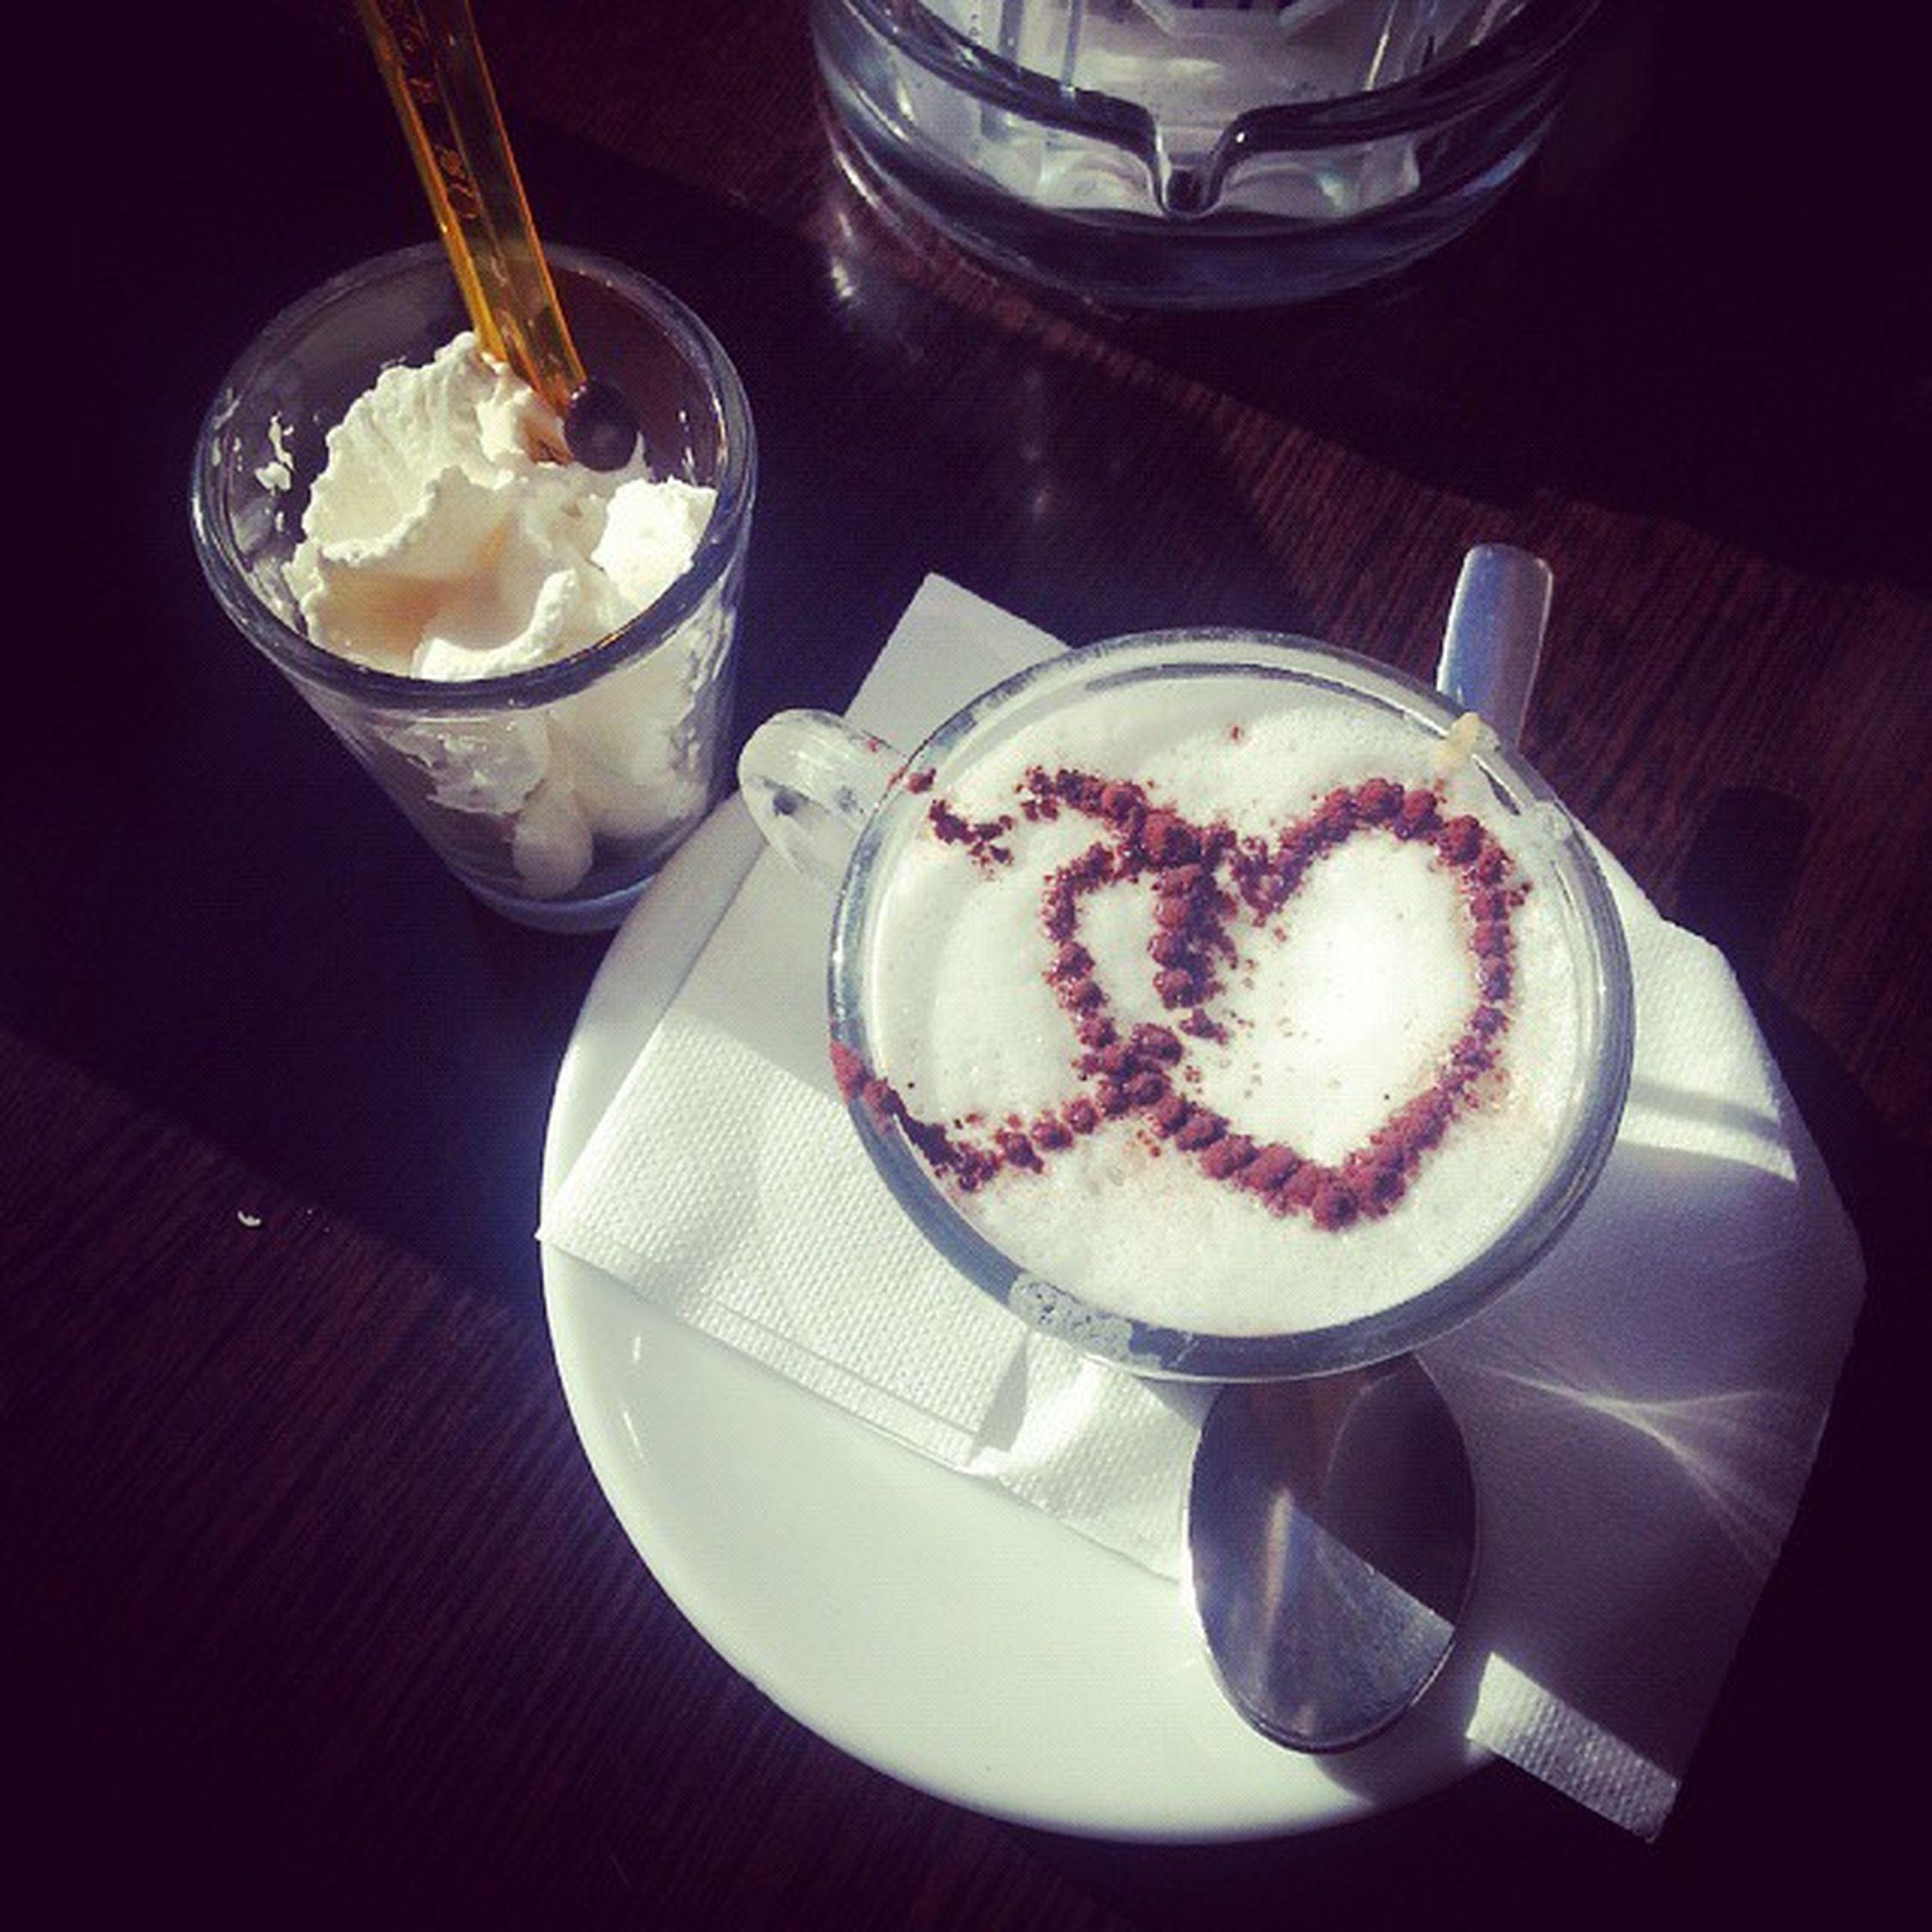 SalernoInLove Coffeelove AirLove ❤🔝👍